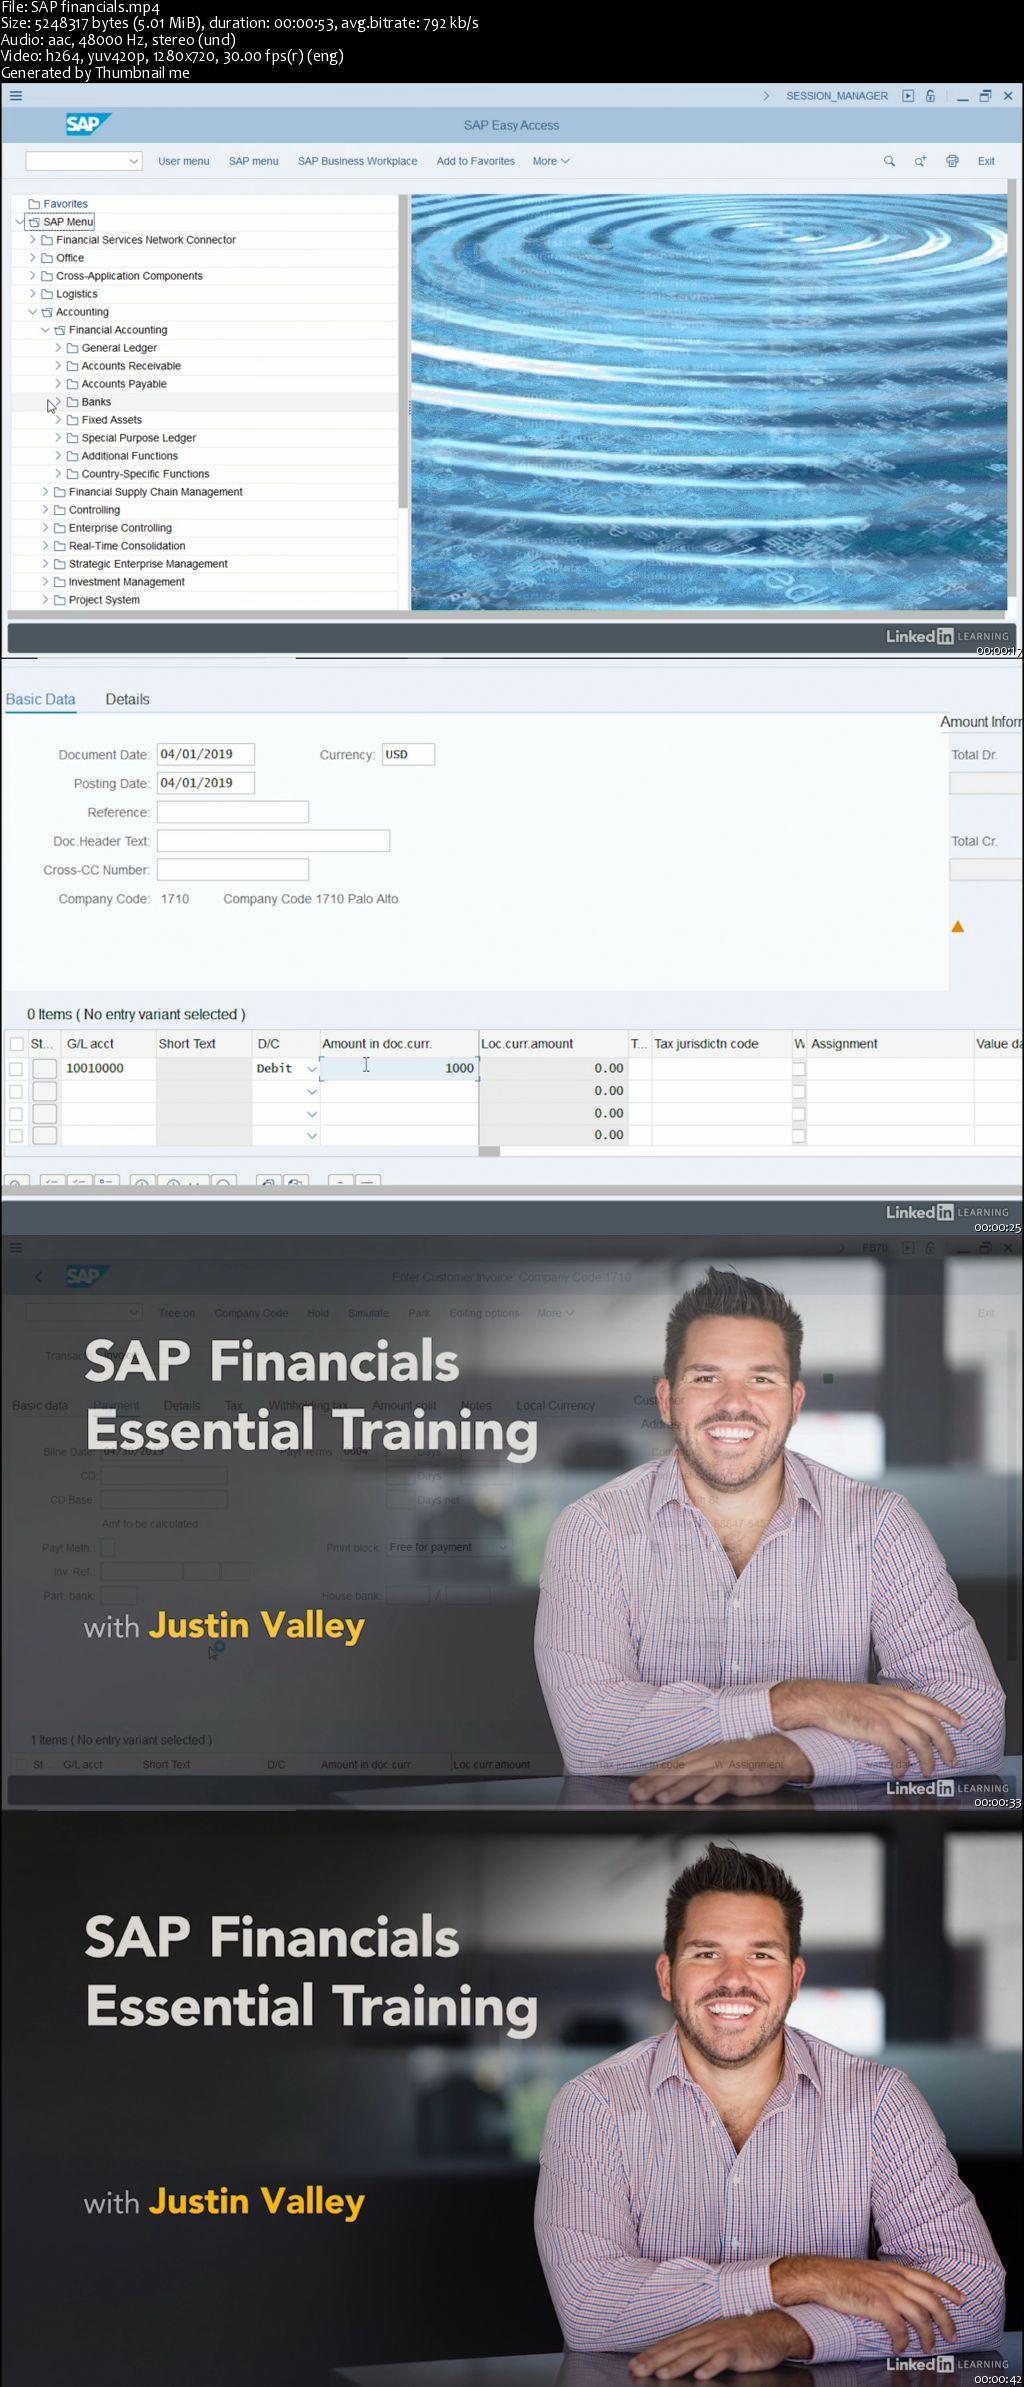 SAP Financials Essential Training